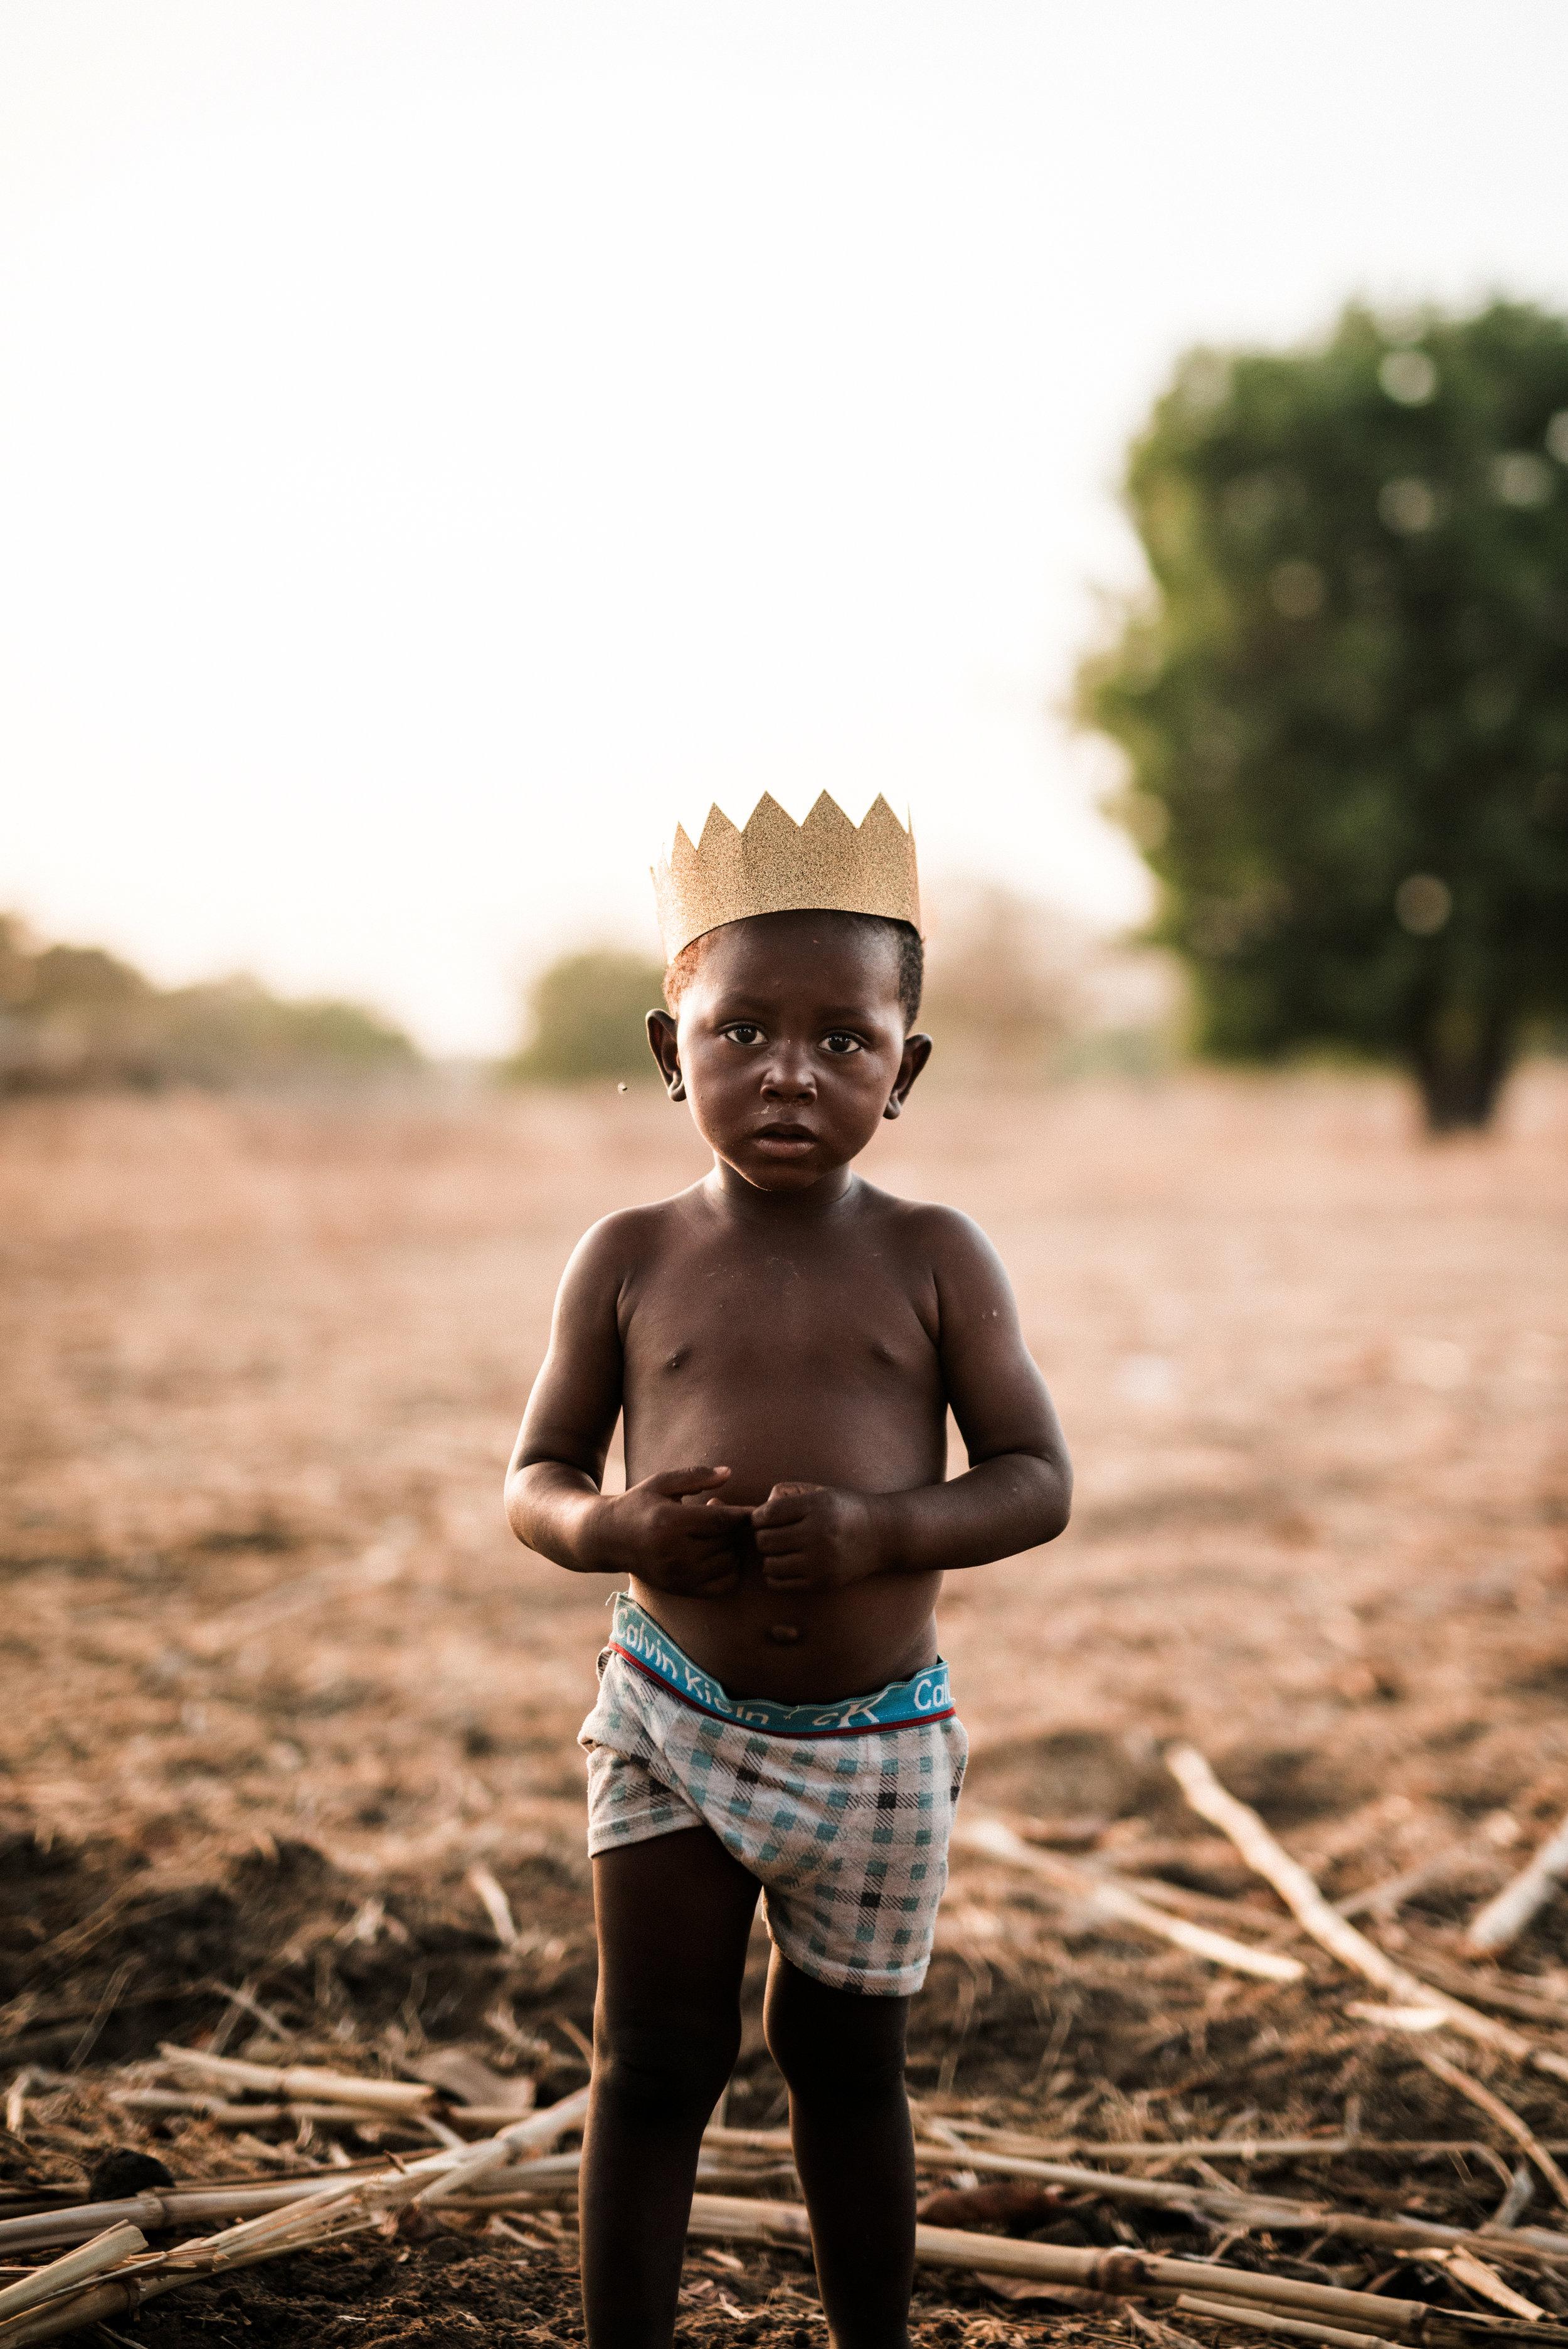 EMBR_Ghana_Africa_Humanitarian_Photographer_TaraShupe_149-FINAL.jpg